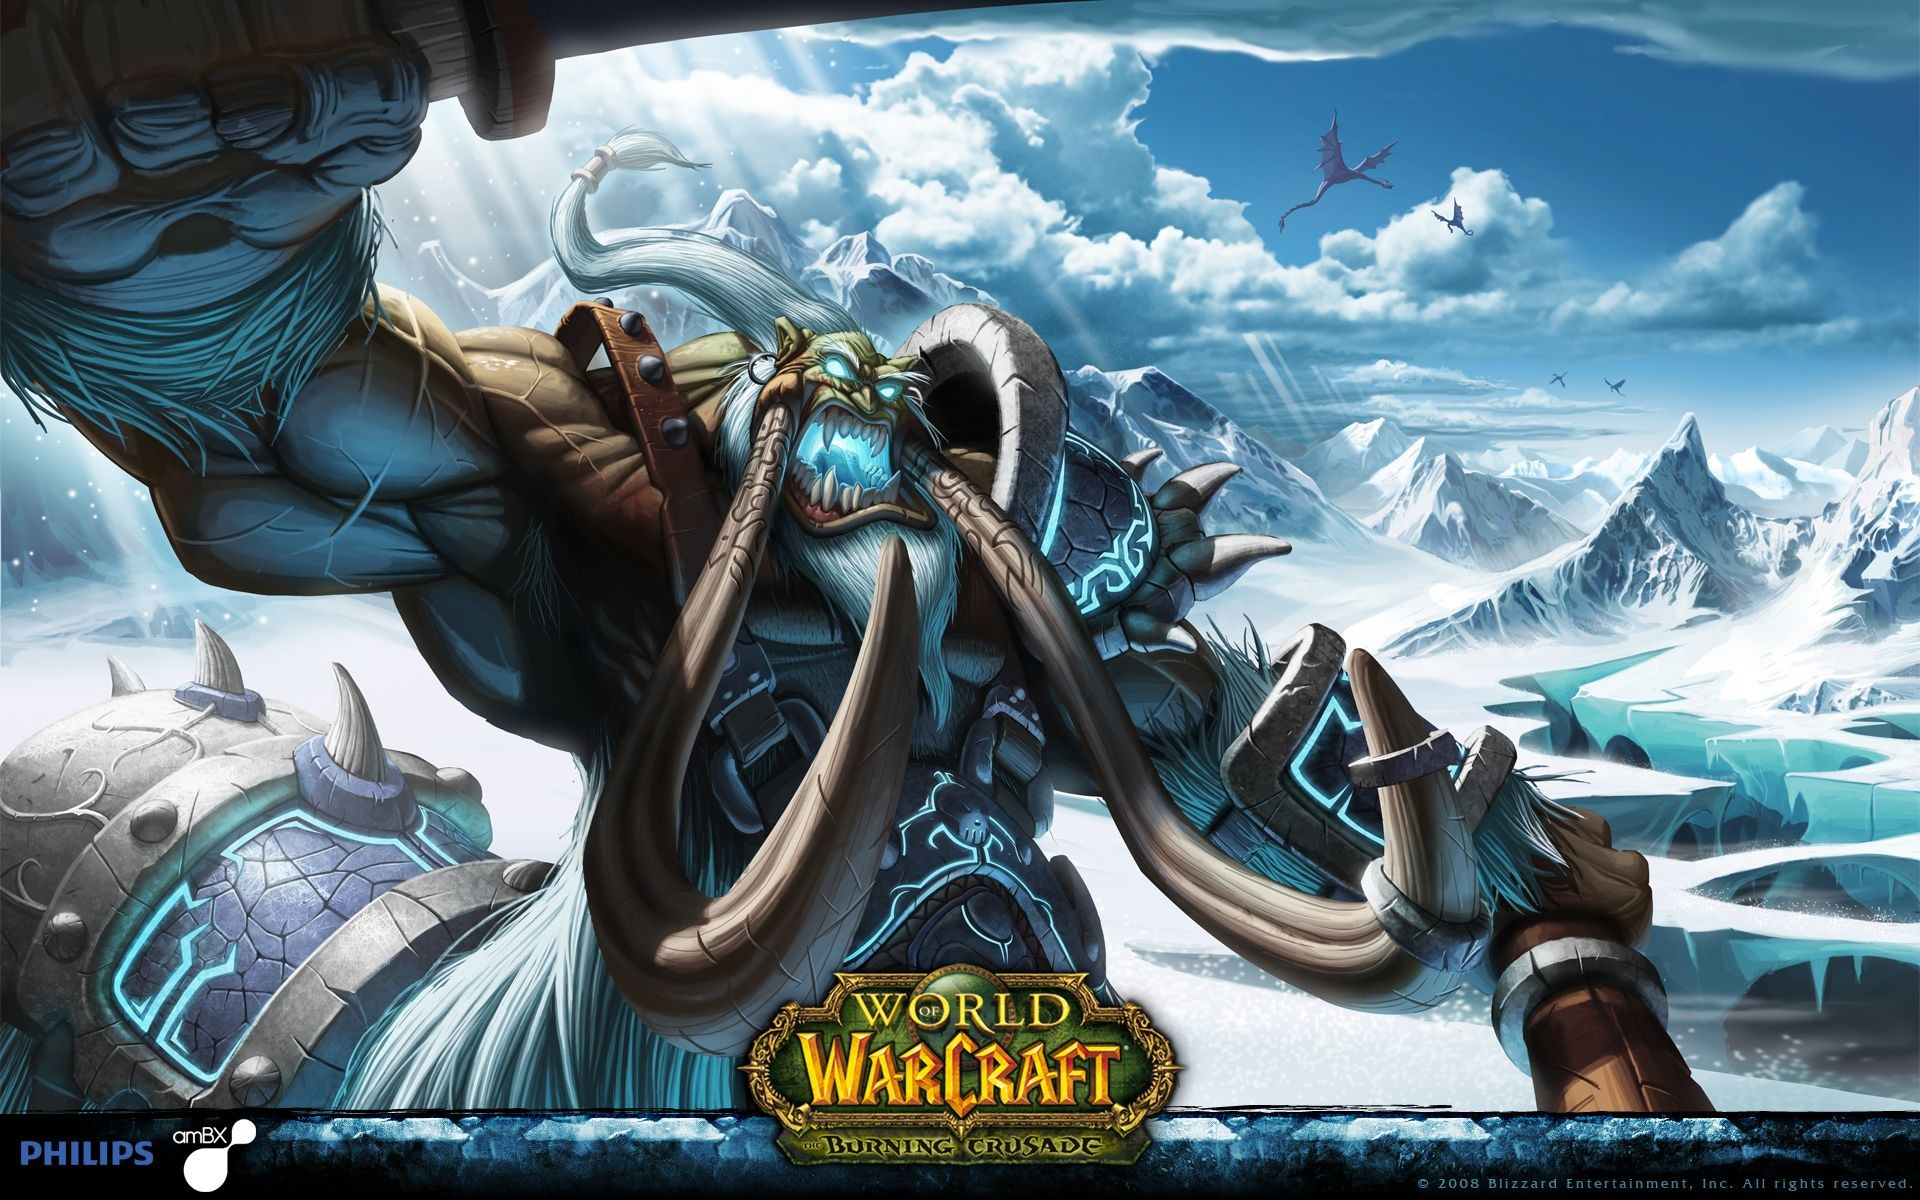 General 1920x1200 World of Warcraft World of Warcraft: The Burning Crusade 2008 (Year) Blizzard Entertainment fantasy art PC gaming